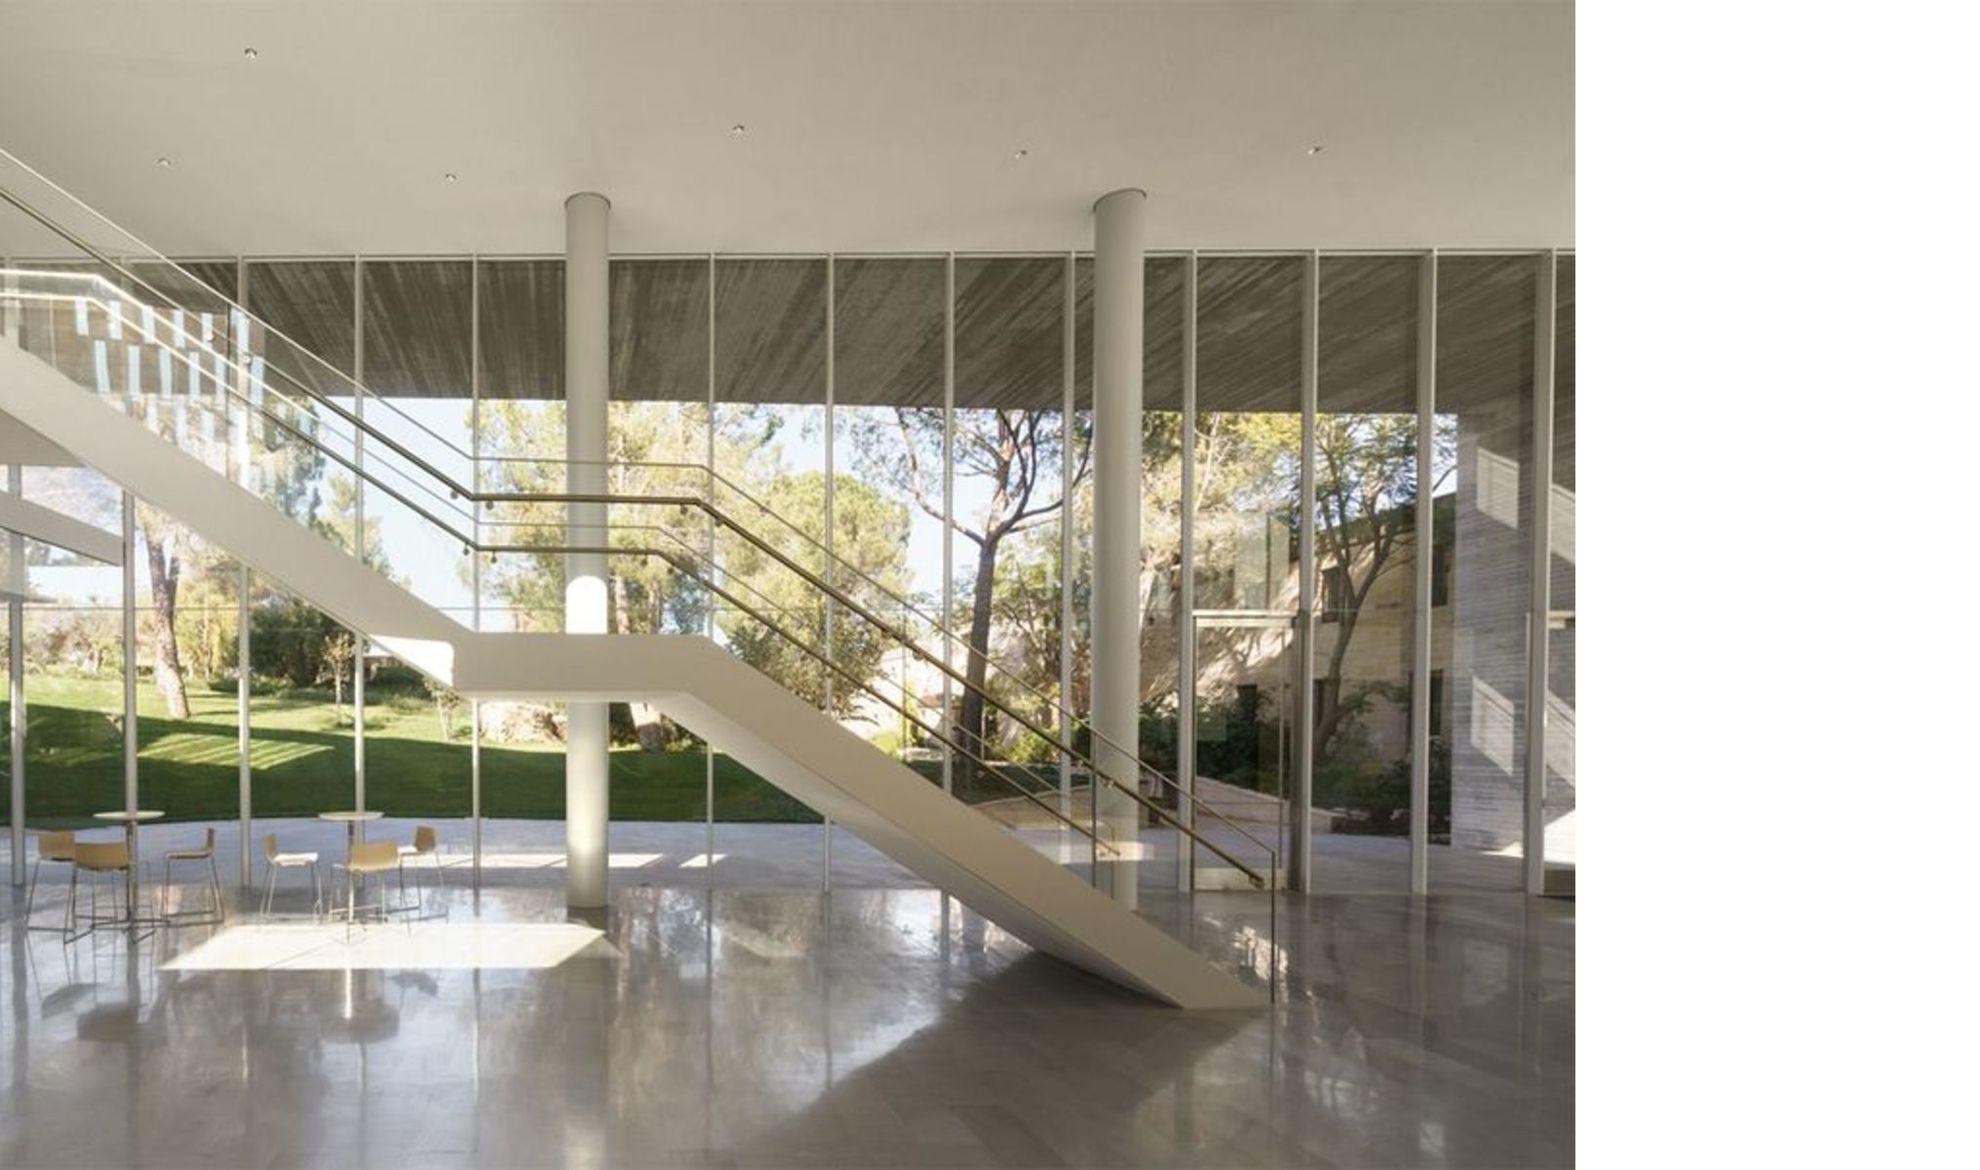 Chyutin: Polonsky Academy for the Van Leer Institute, Jerusalem